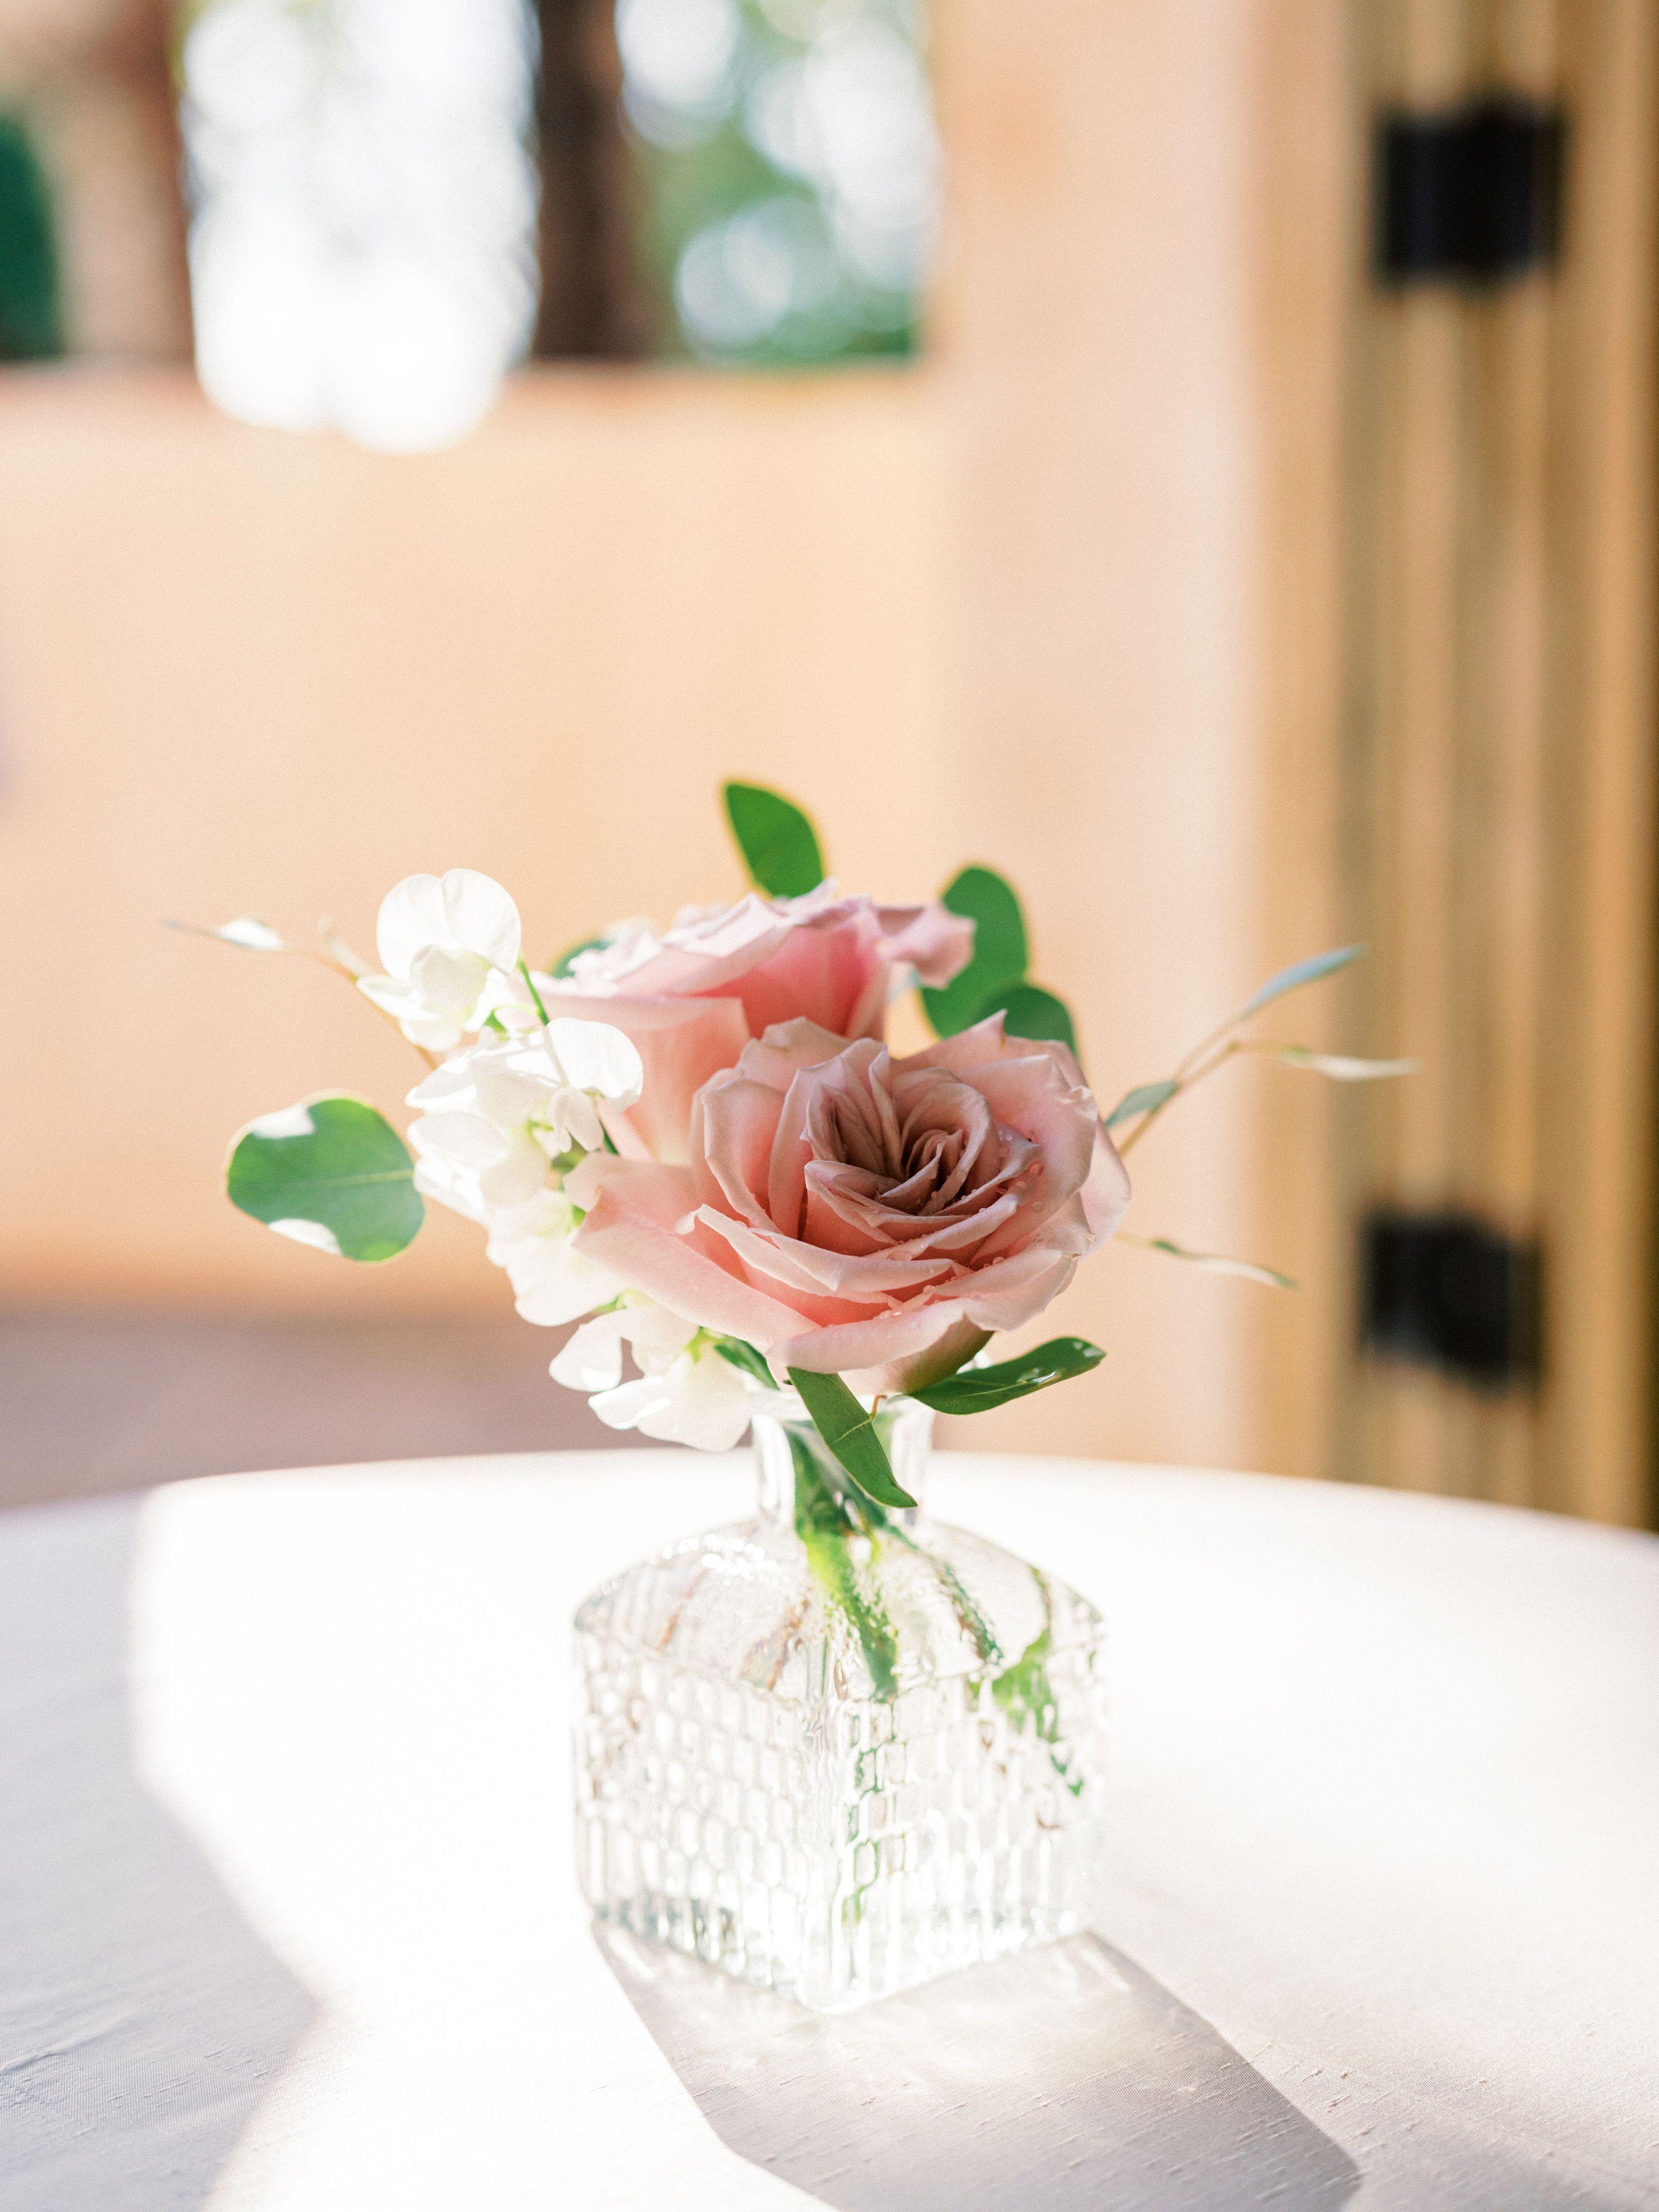 Cocktail floral royal palms in 2020 wedding florist